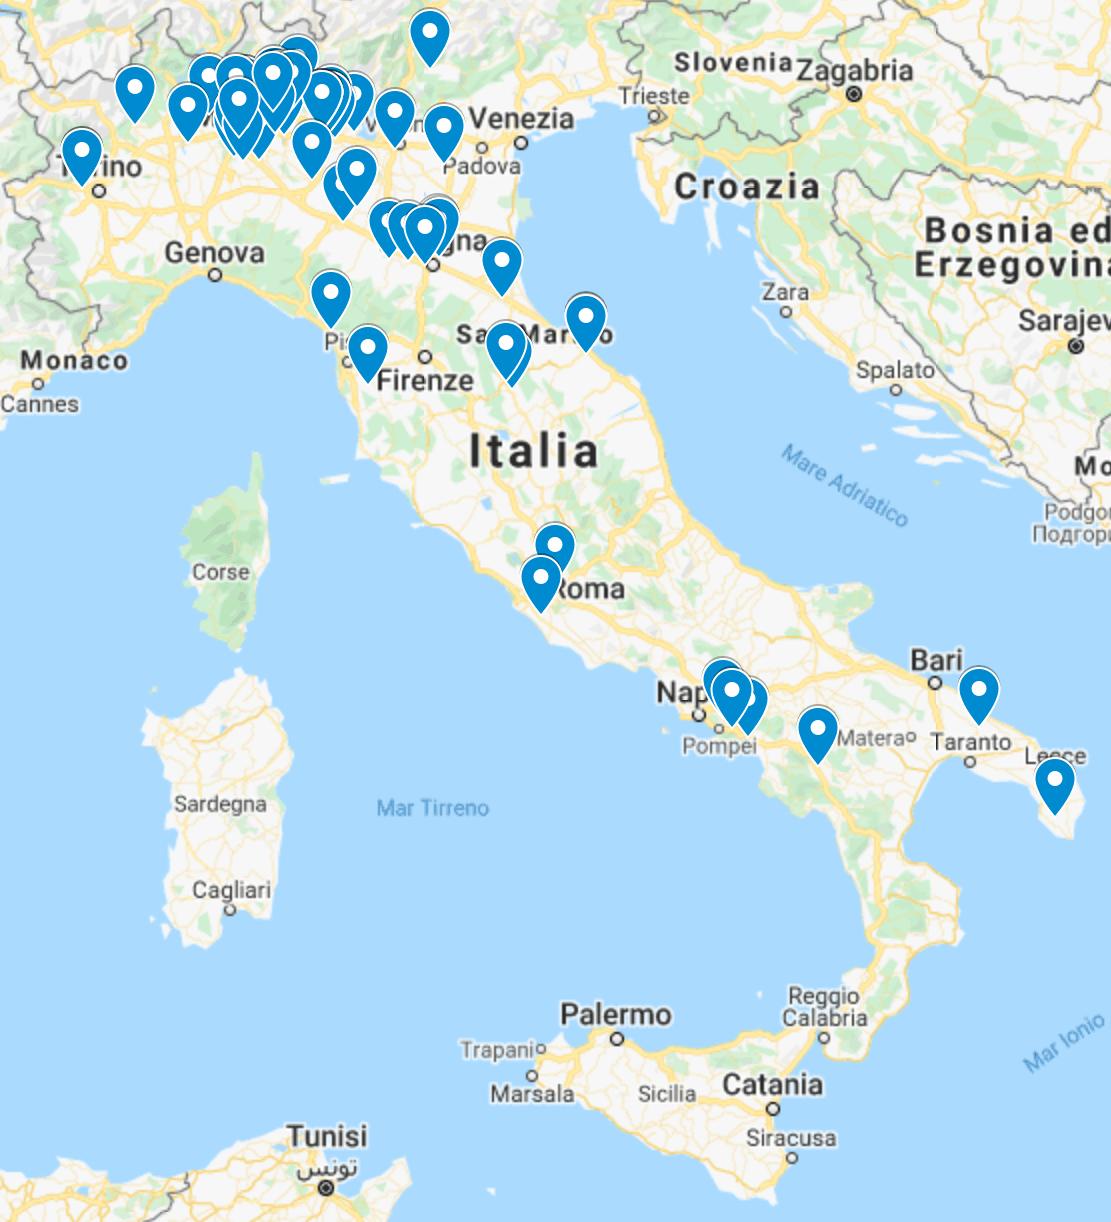 LIYU ITALIA periferiche installate